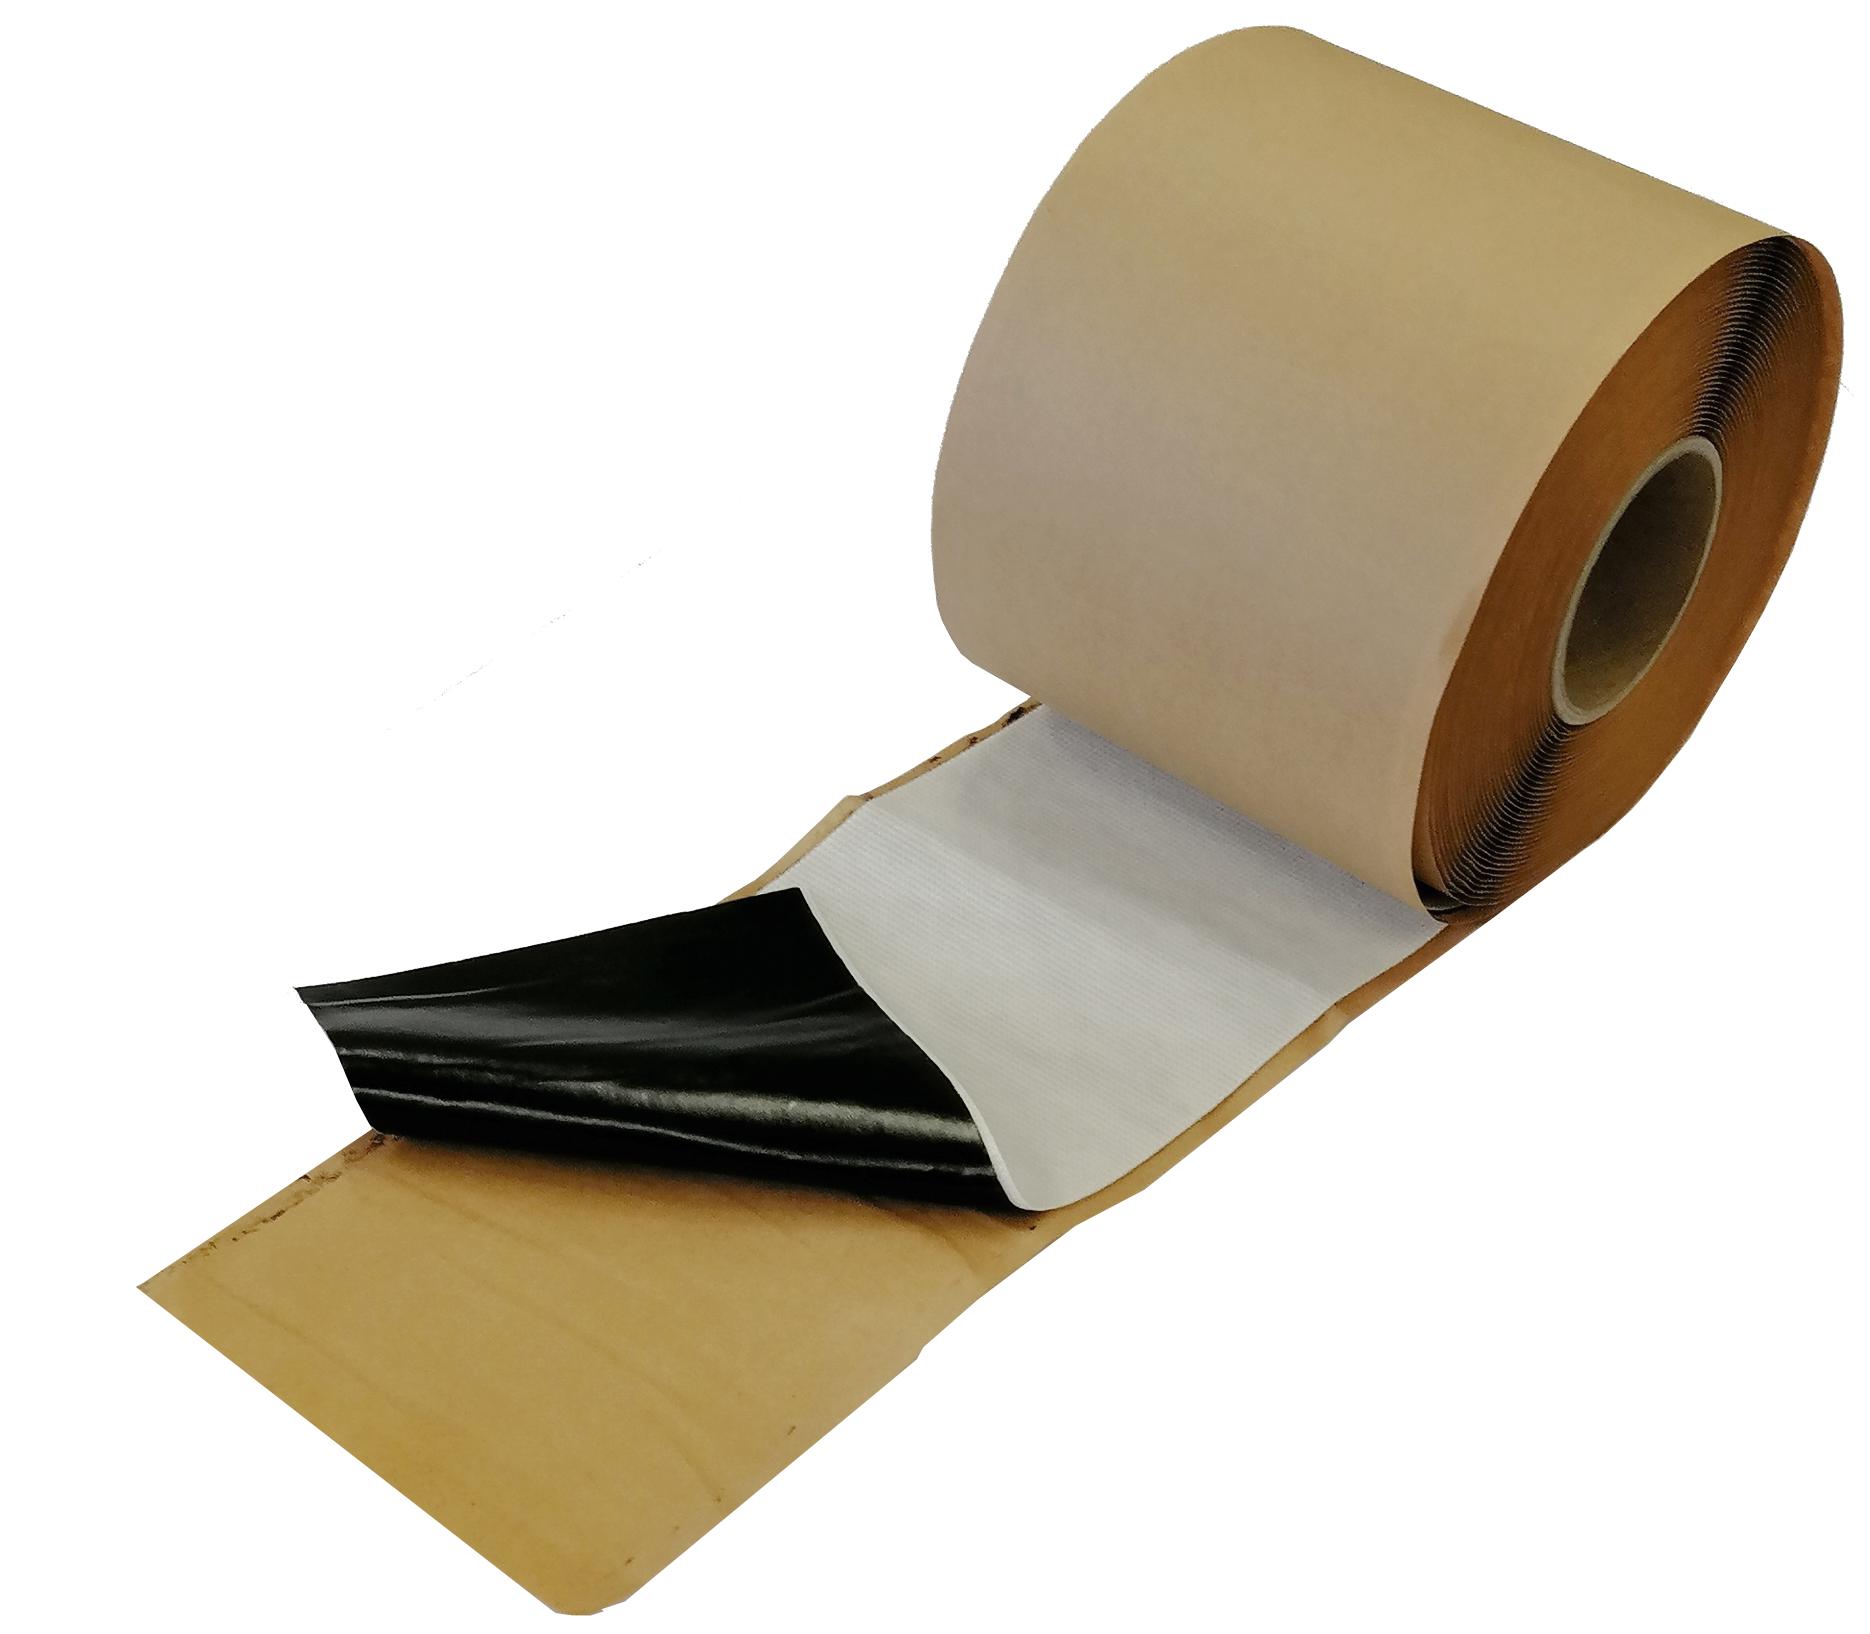 Roll of Maflowrap Fabric Backed Tape